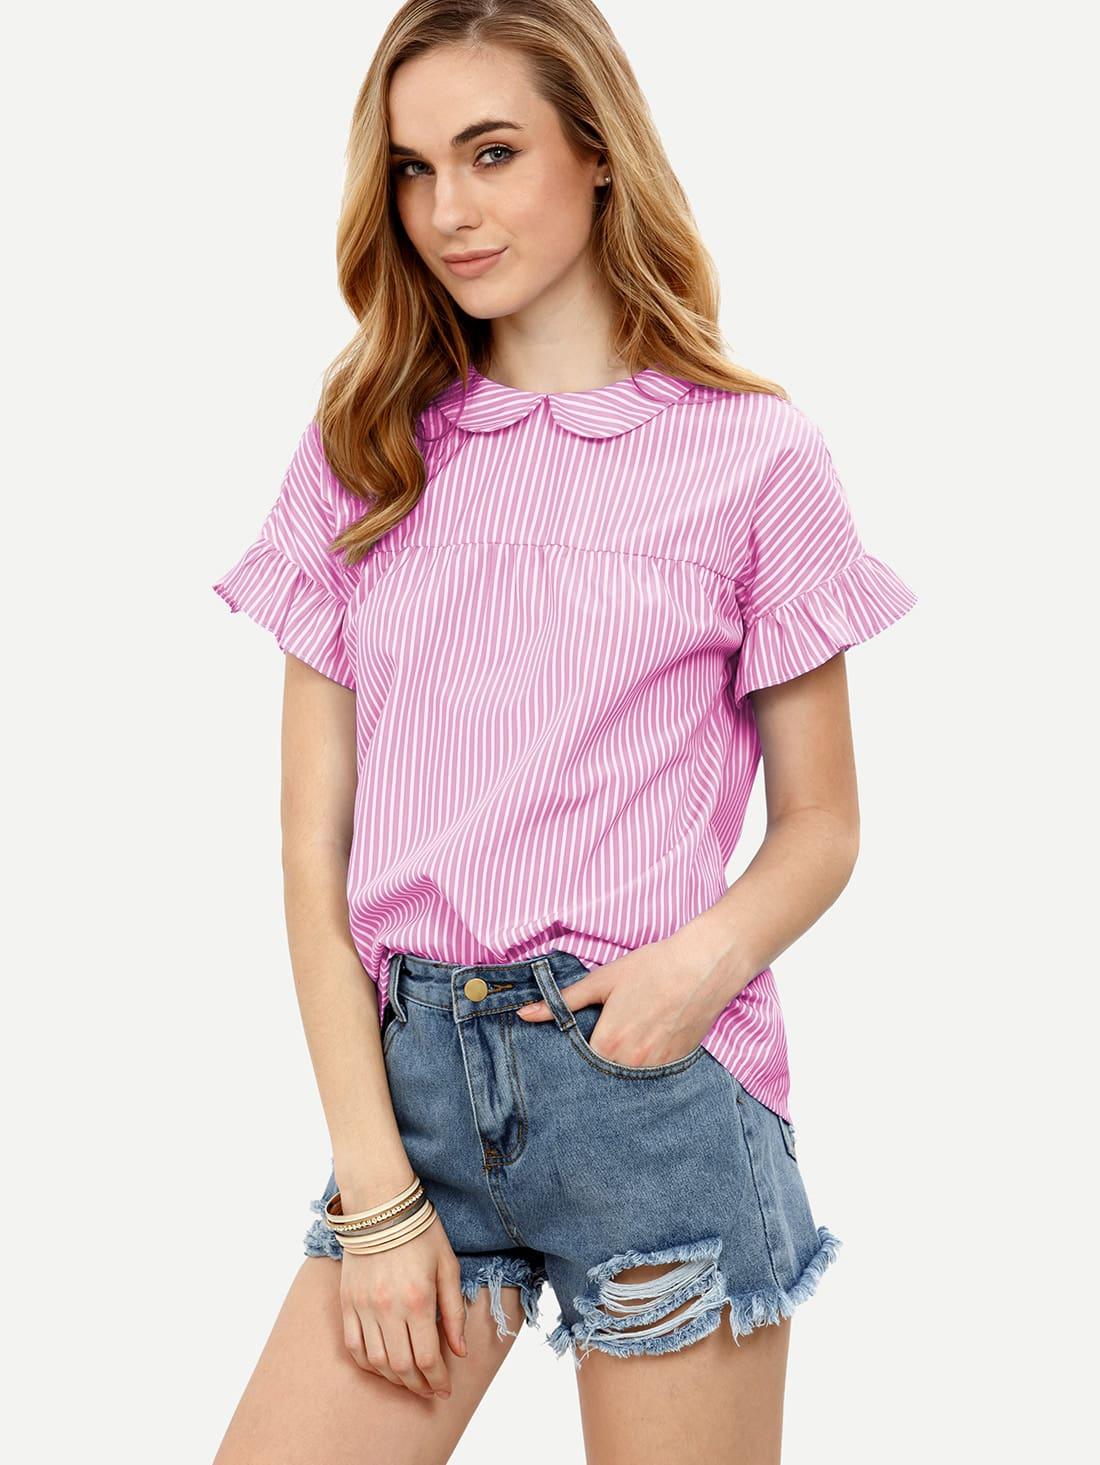 blouse170324701_2